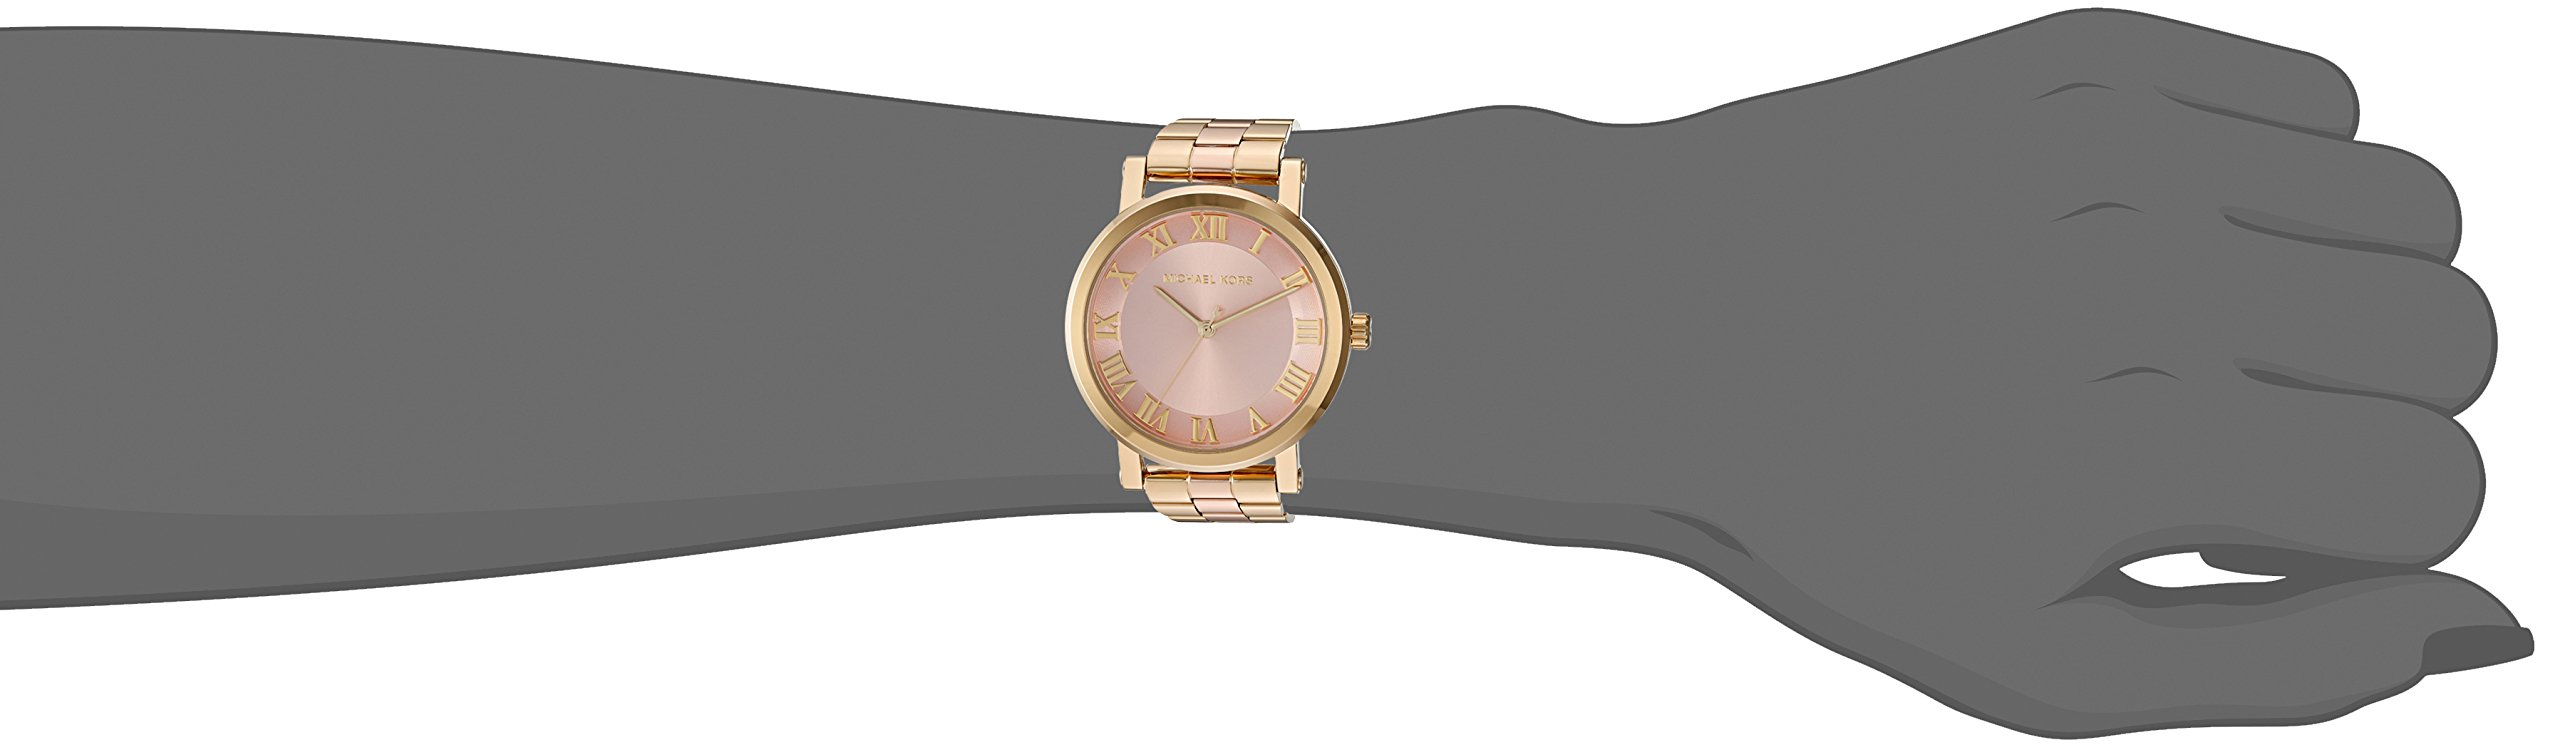 MICHAEL-KORS-Armbanduhr-MK3586